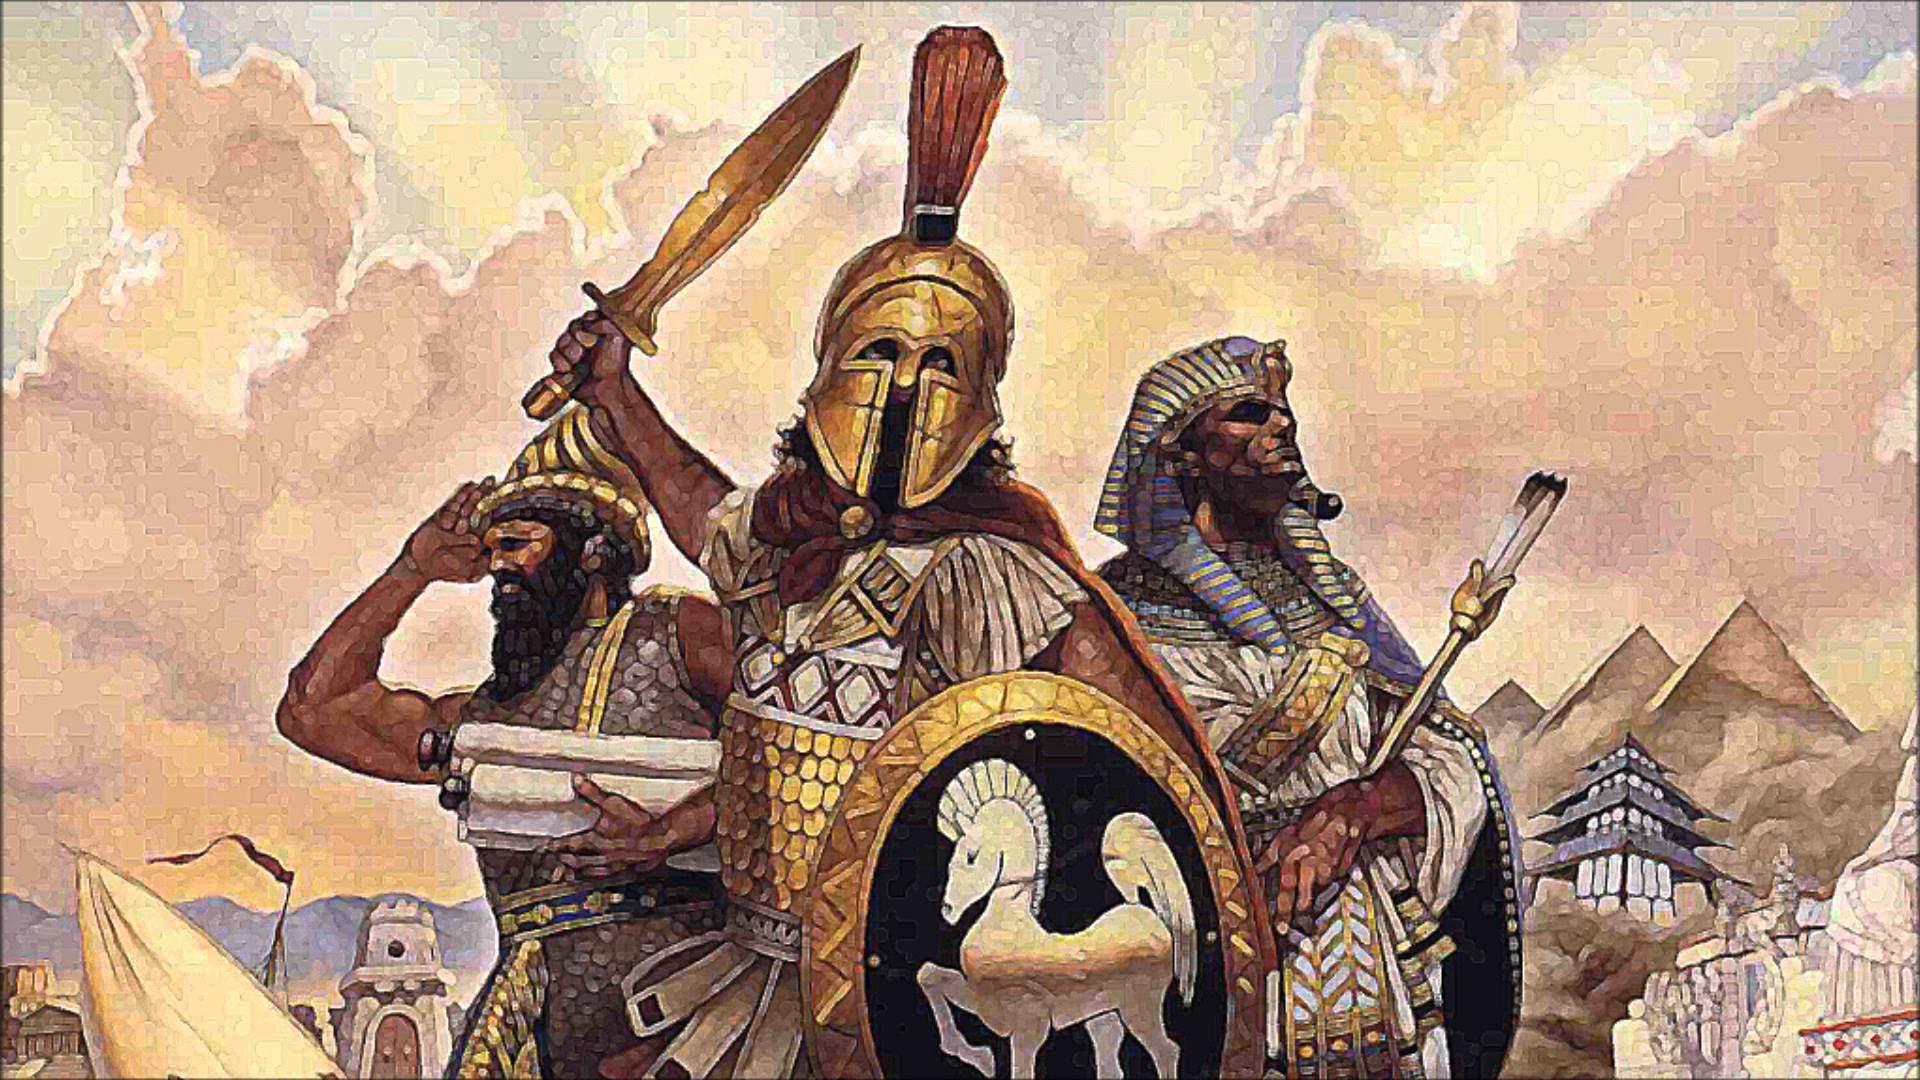 Imagen de Age of Empires: Definitive Edition y Rise of Nations llegarán a Xbox One